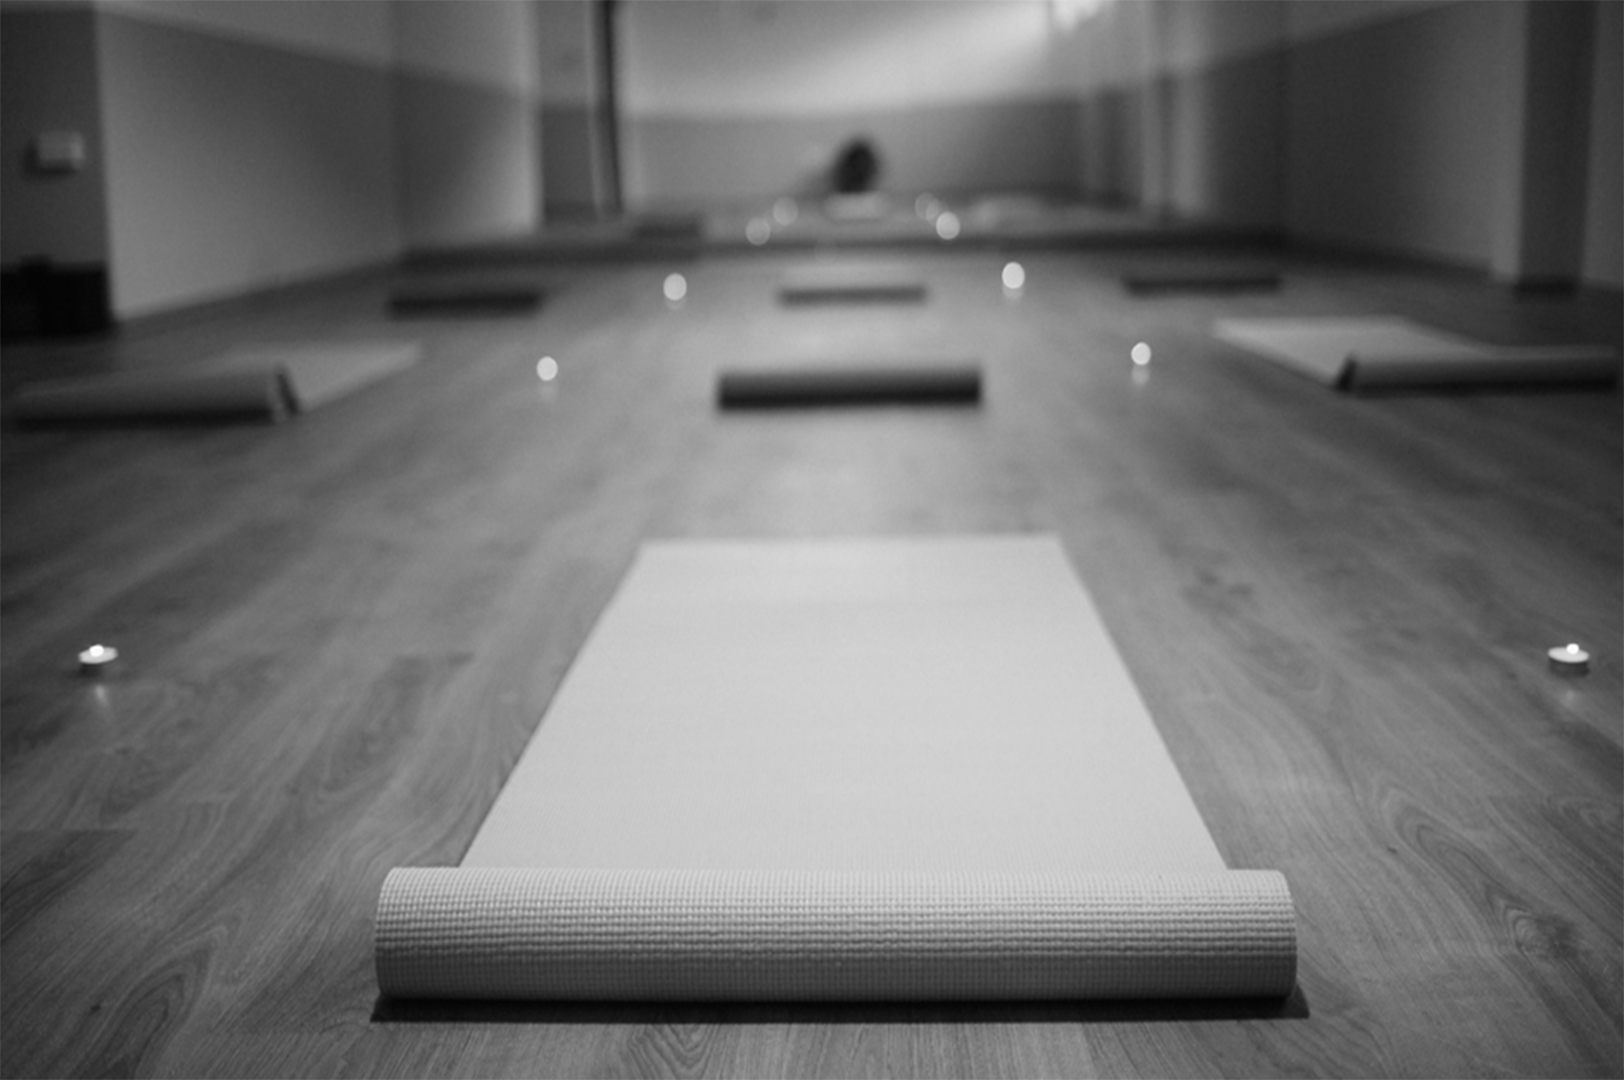 Whetstone Wellness - Cultivating Self-Care through Community